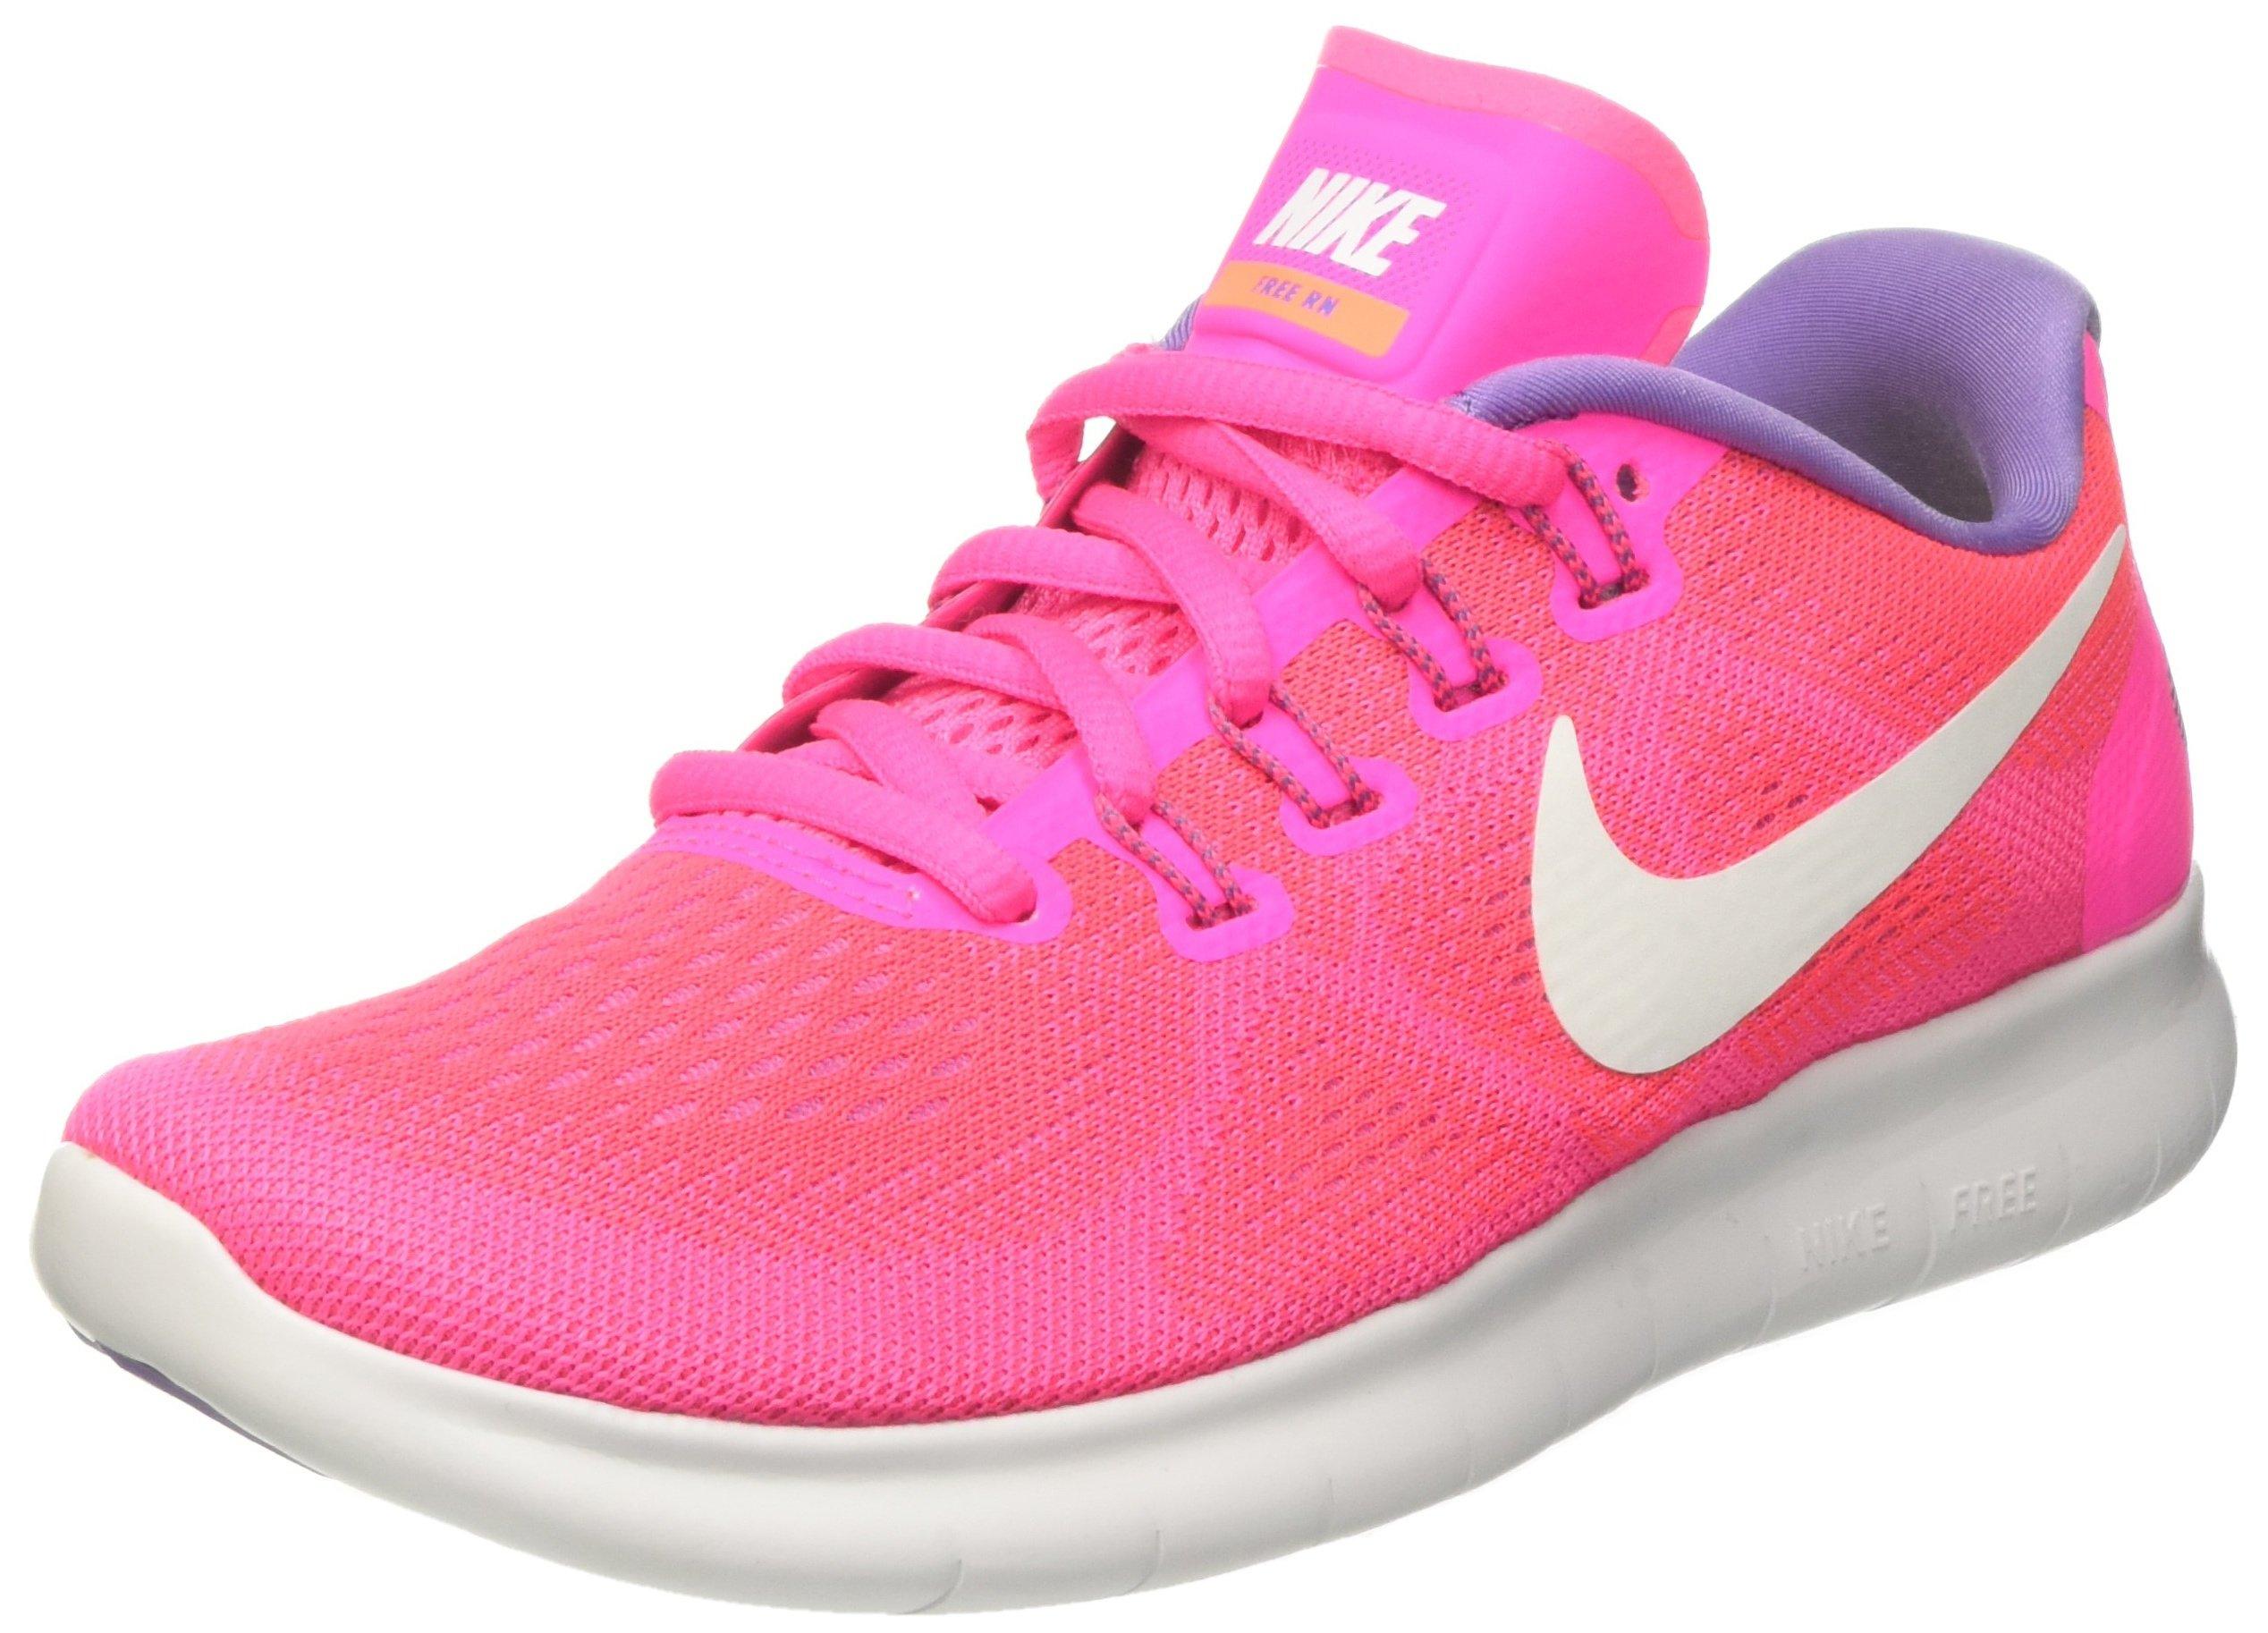 Nike Womens RN 2017 Size 7.5 601RCRPNK/OFWHPNKBLS